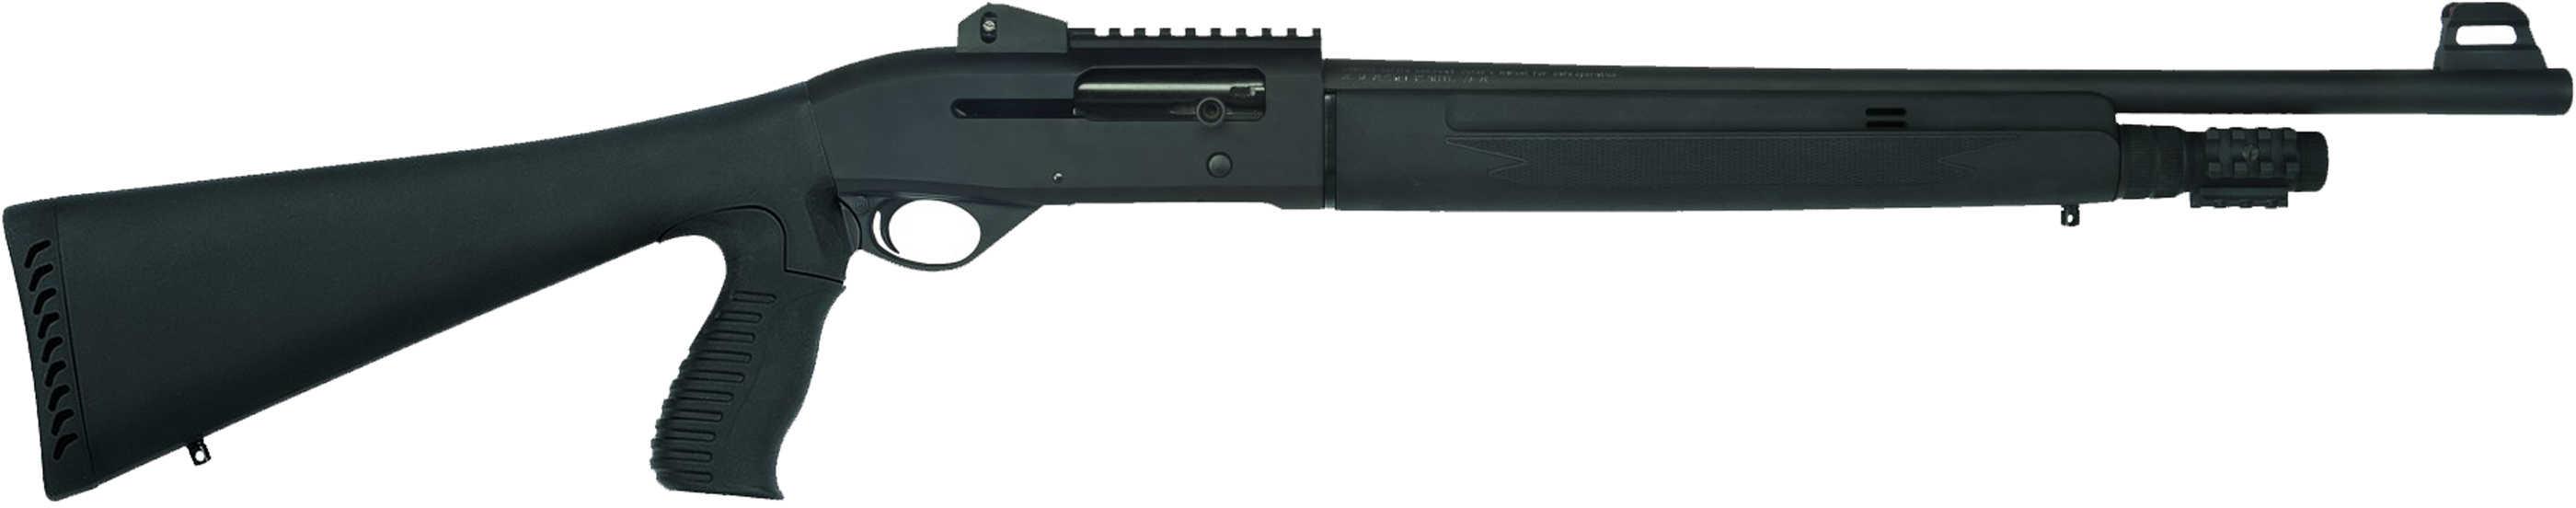 "Mossberg SA-20 20 Gauge 20"" Barrel Tactical Pistol Grip Stock 14"" Length of Pull Black Synthetic Shotgun 75780"